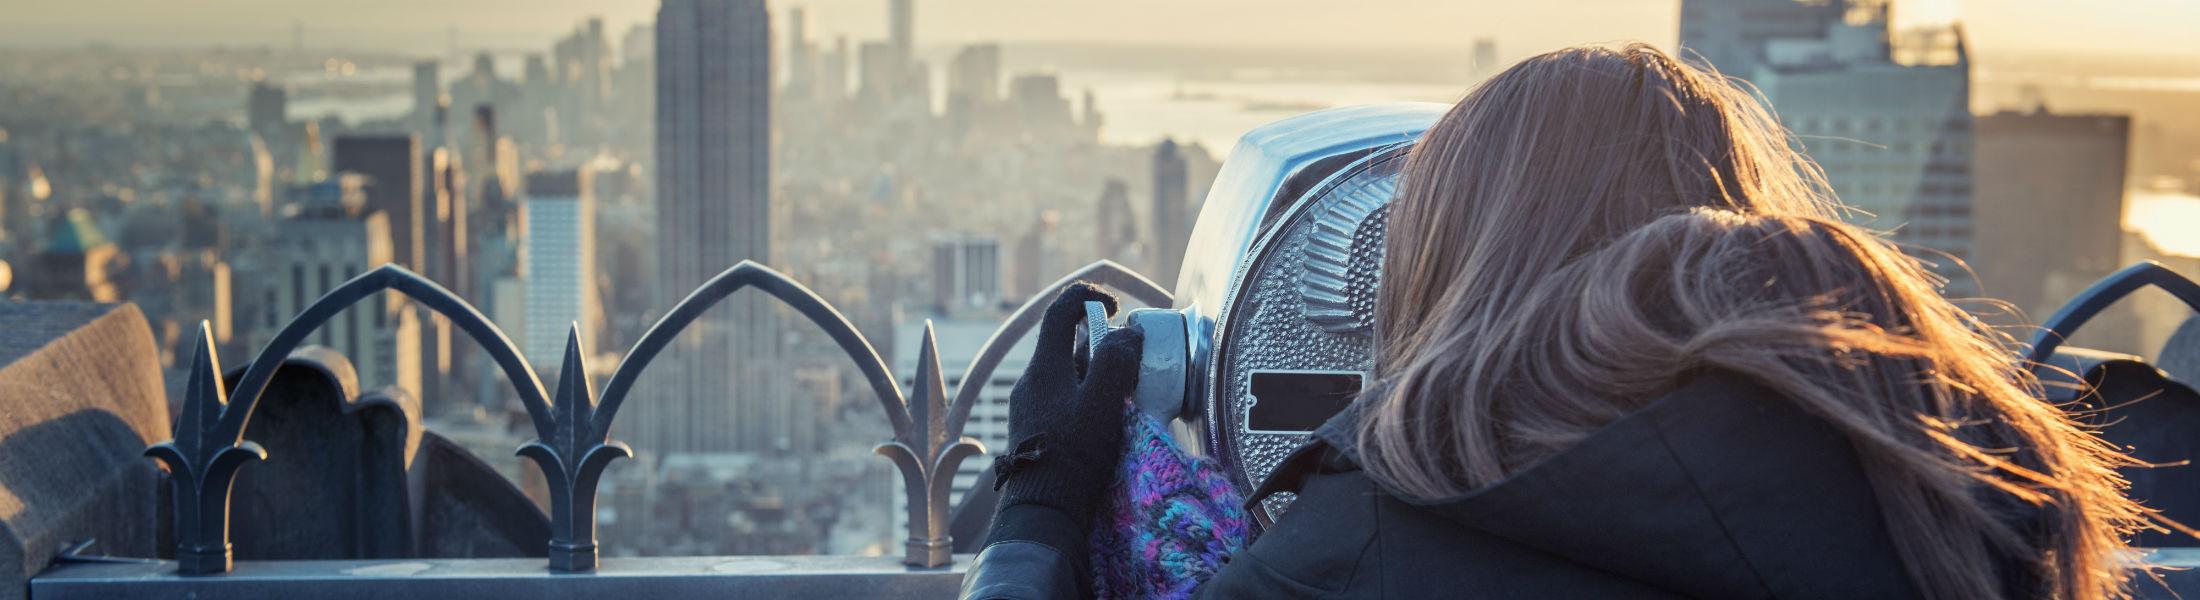 Skyscraper view of New York